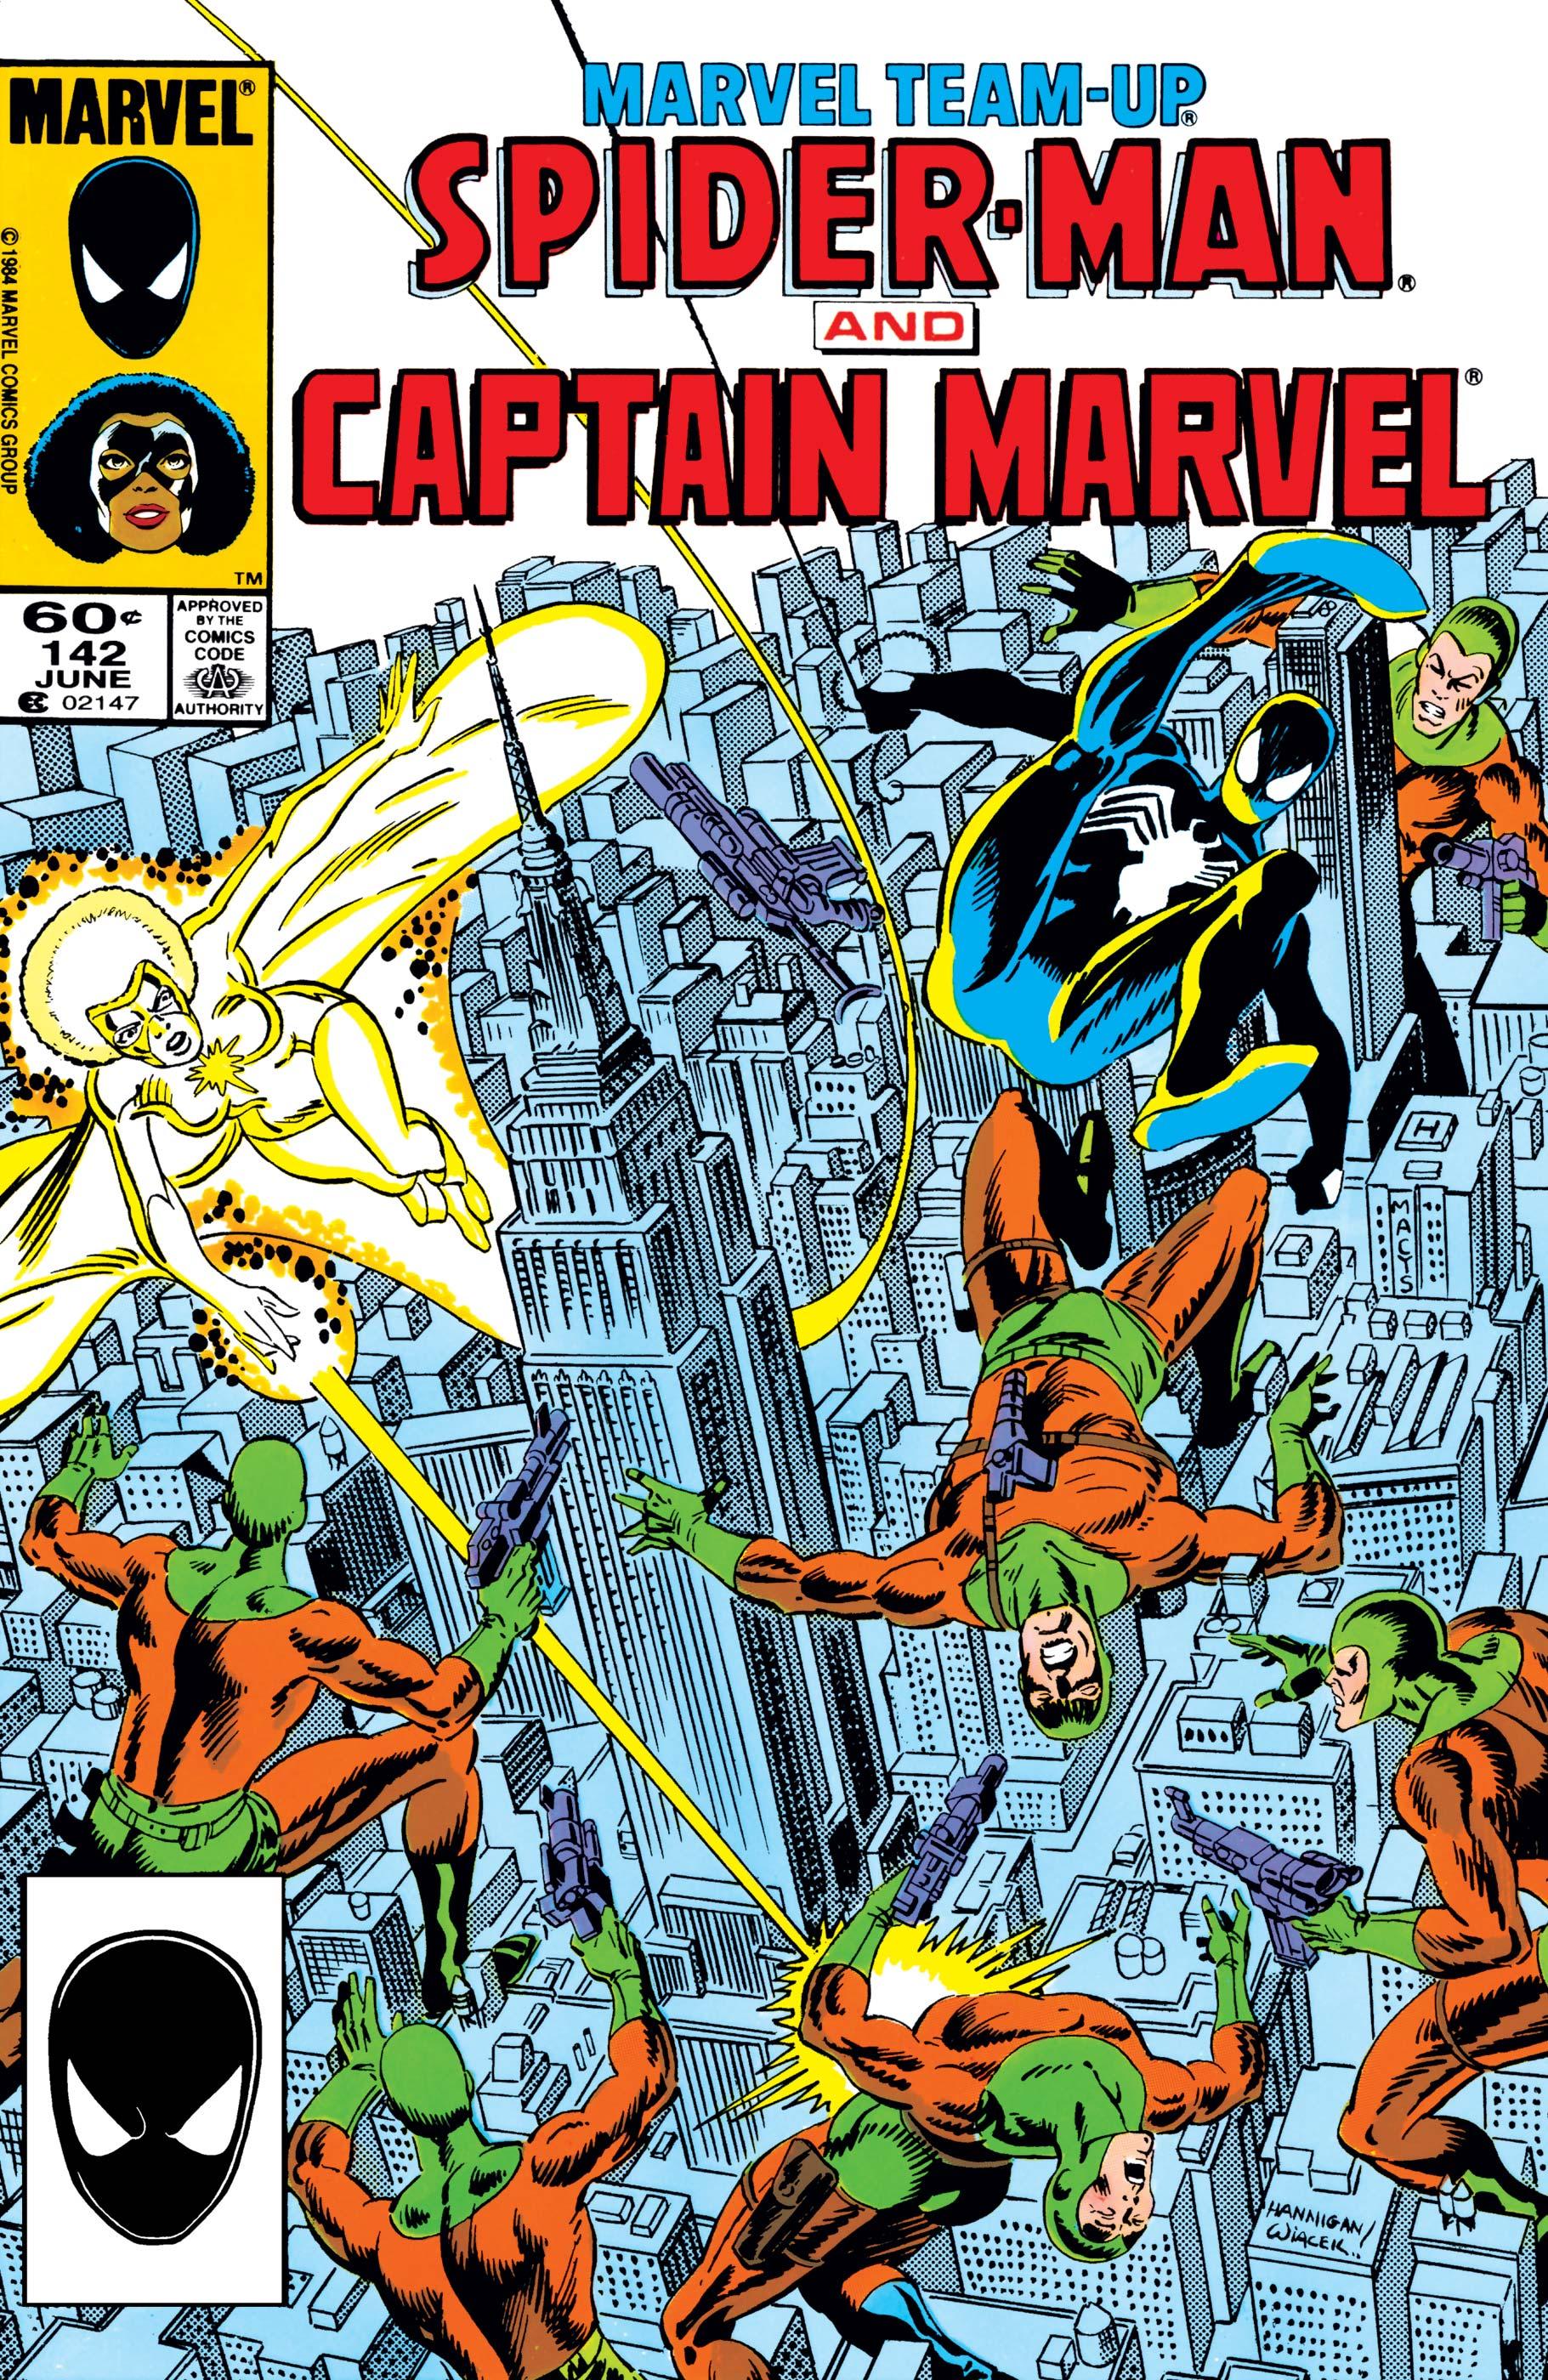 Marvel Team-Up (1972) #142